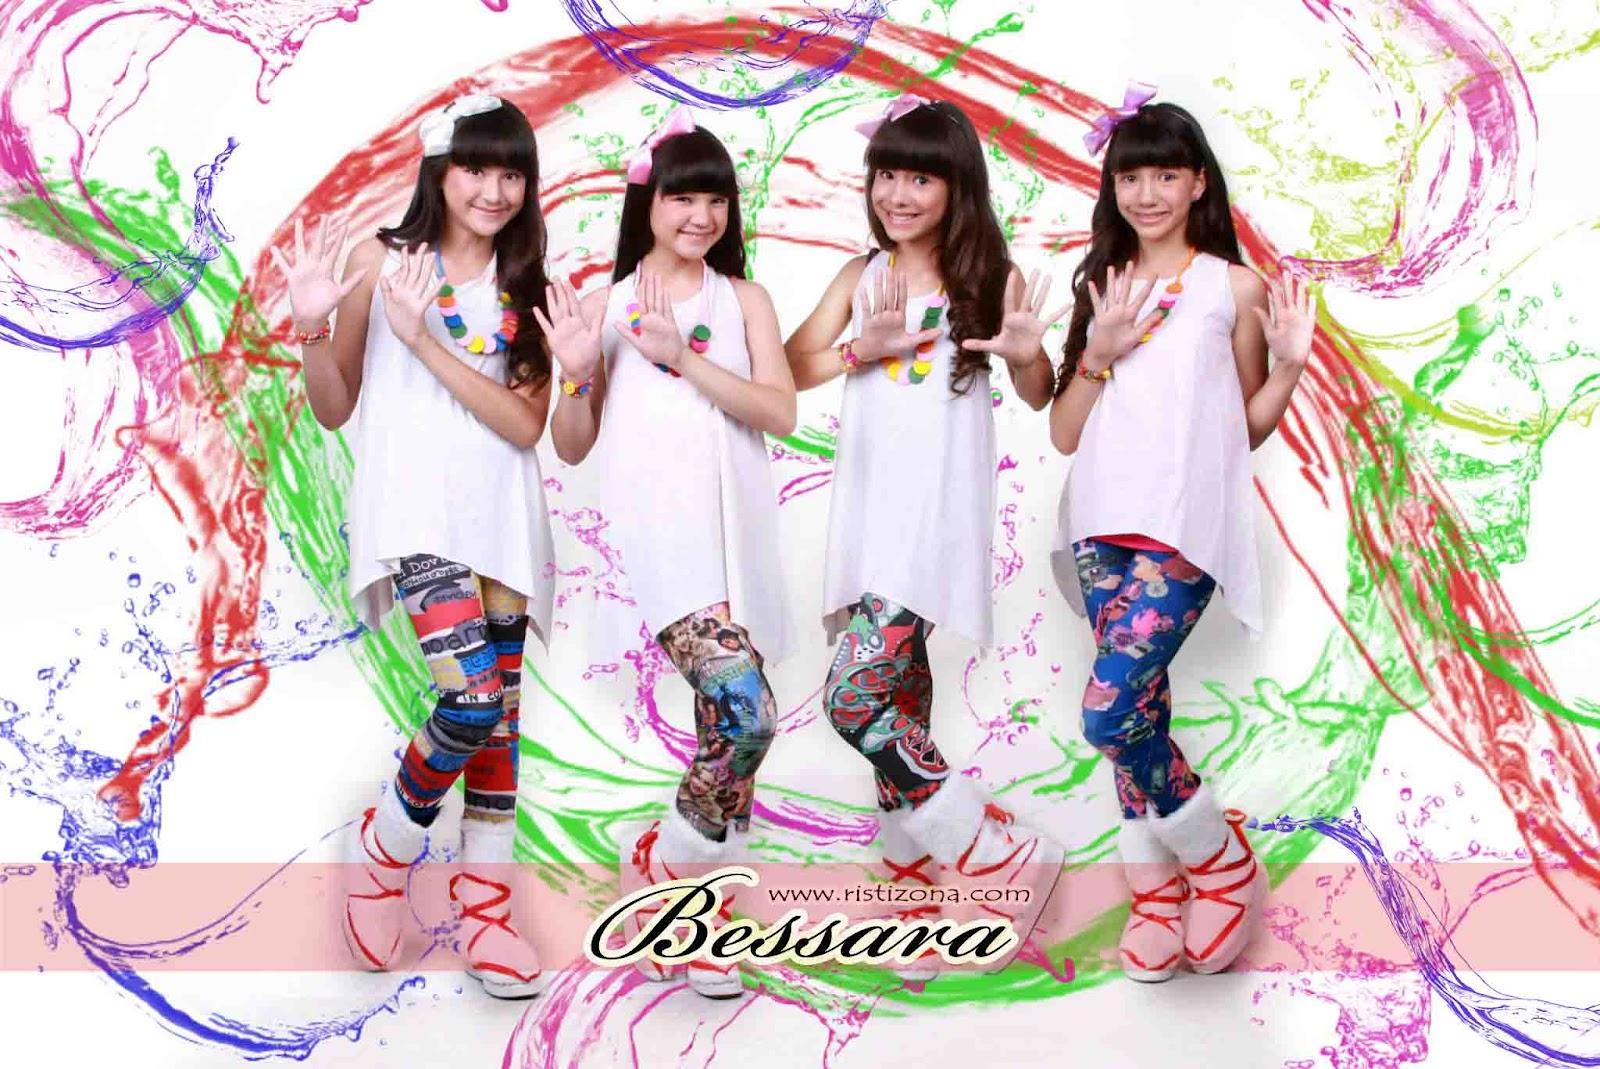 foto bessara girlband foto cantik bessara